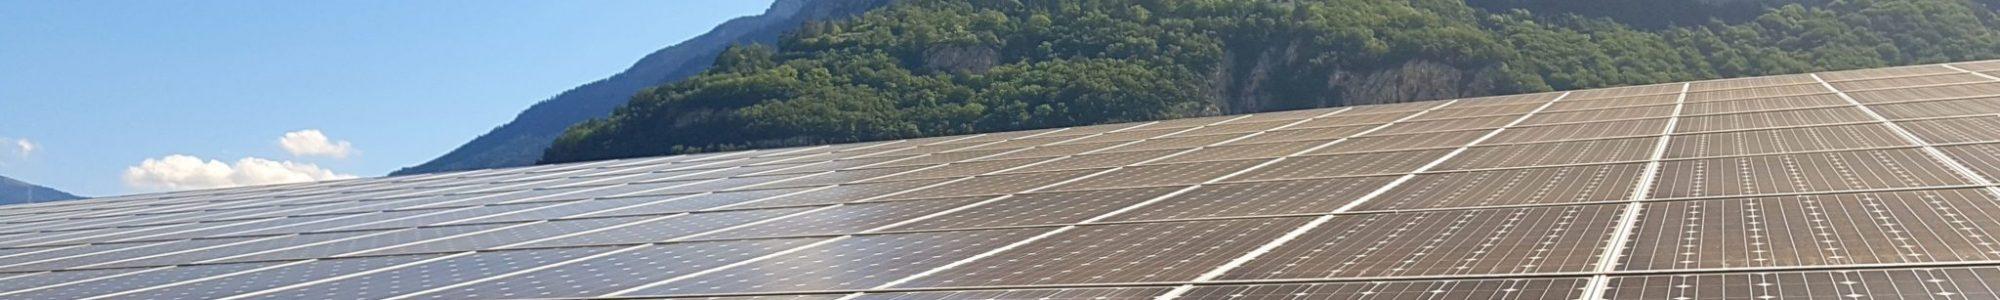 energie-photovoltaique-valais